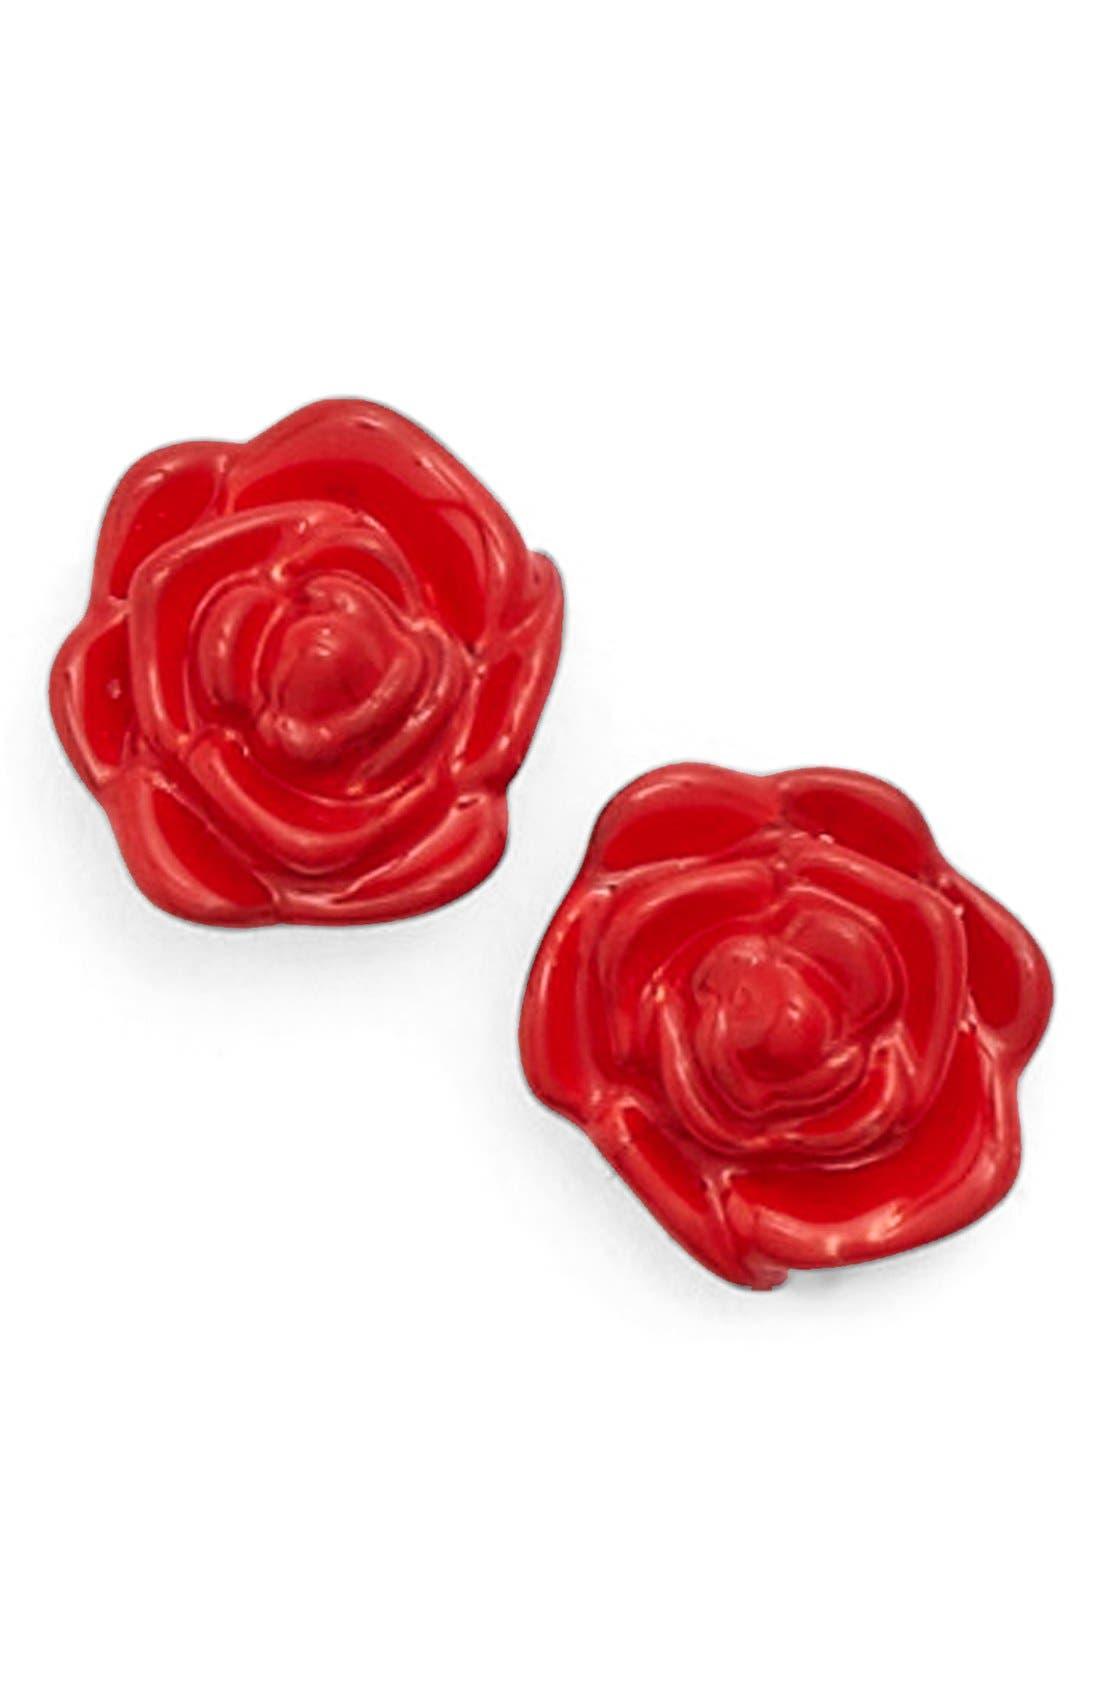 Alternate Image 1 Selected - kate spade new york 'rosy outlook' stud earrings